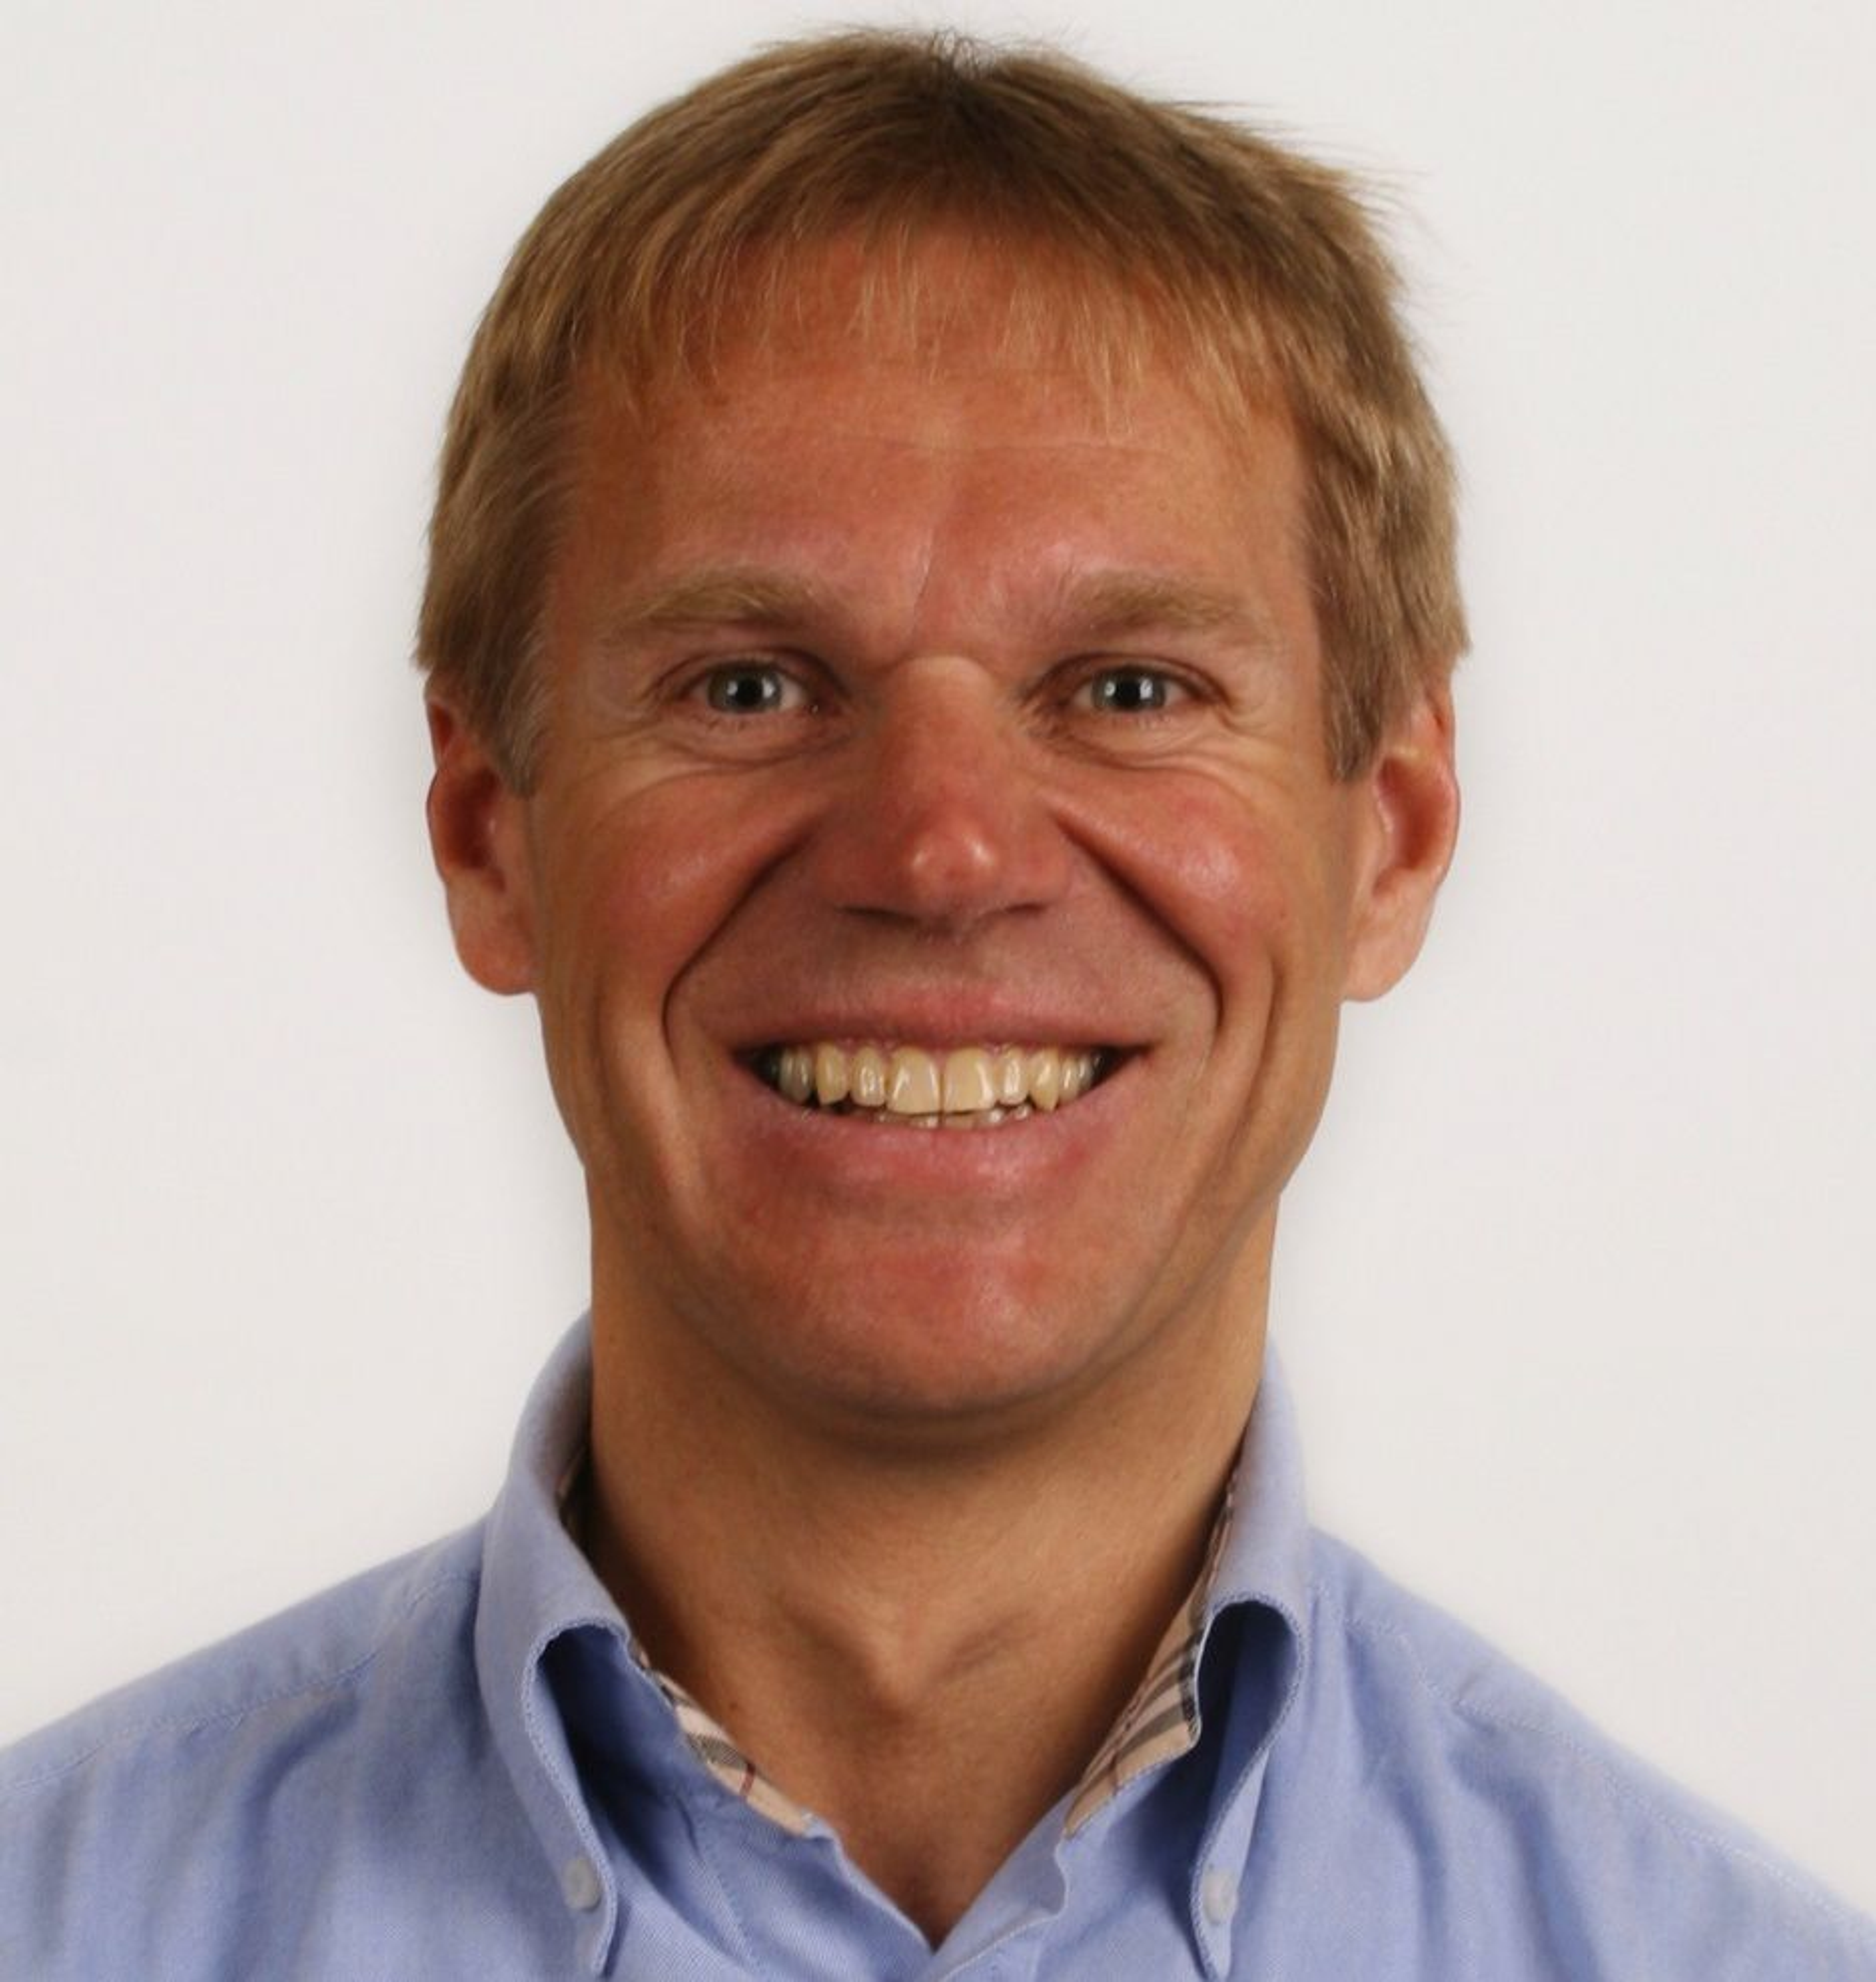 Ole-Petter Thune, administrerende direktør for Rambøll i Norge